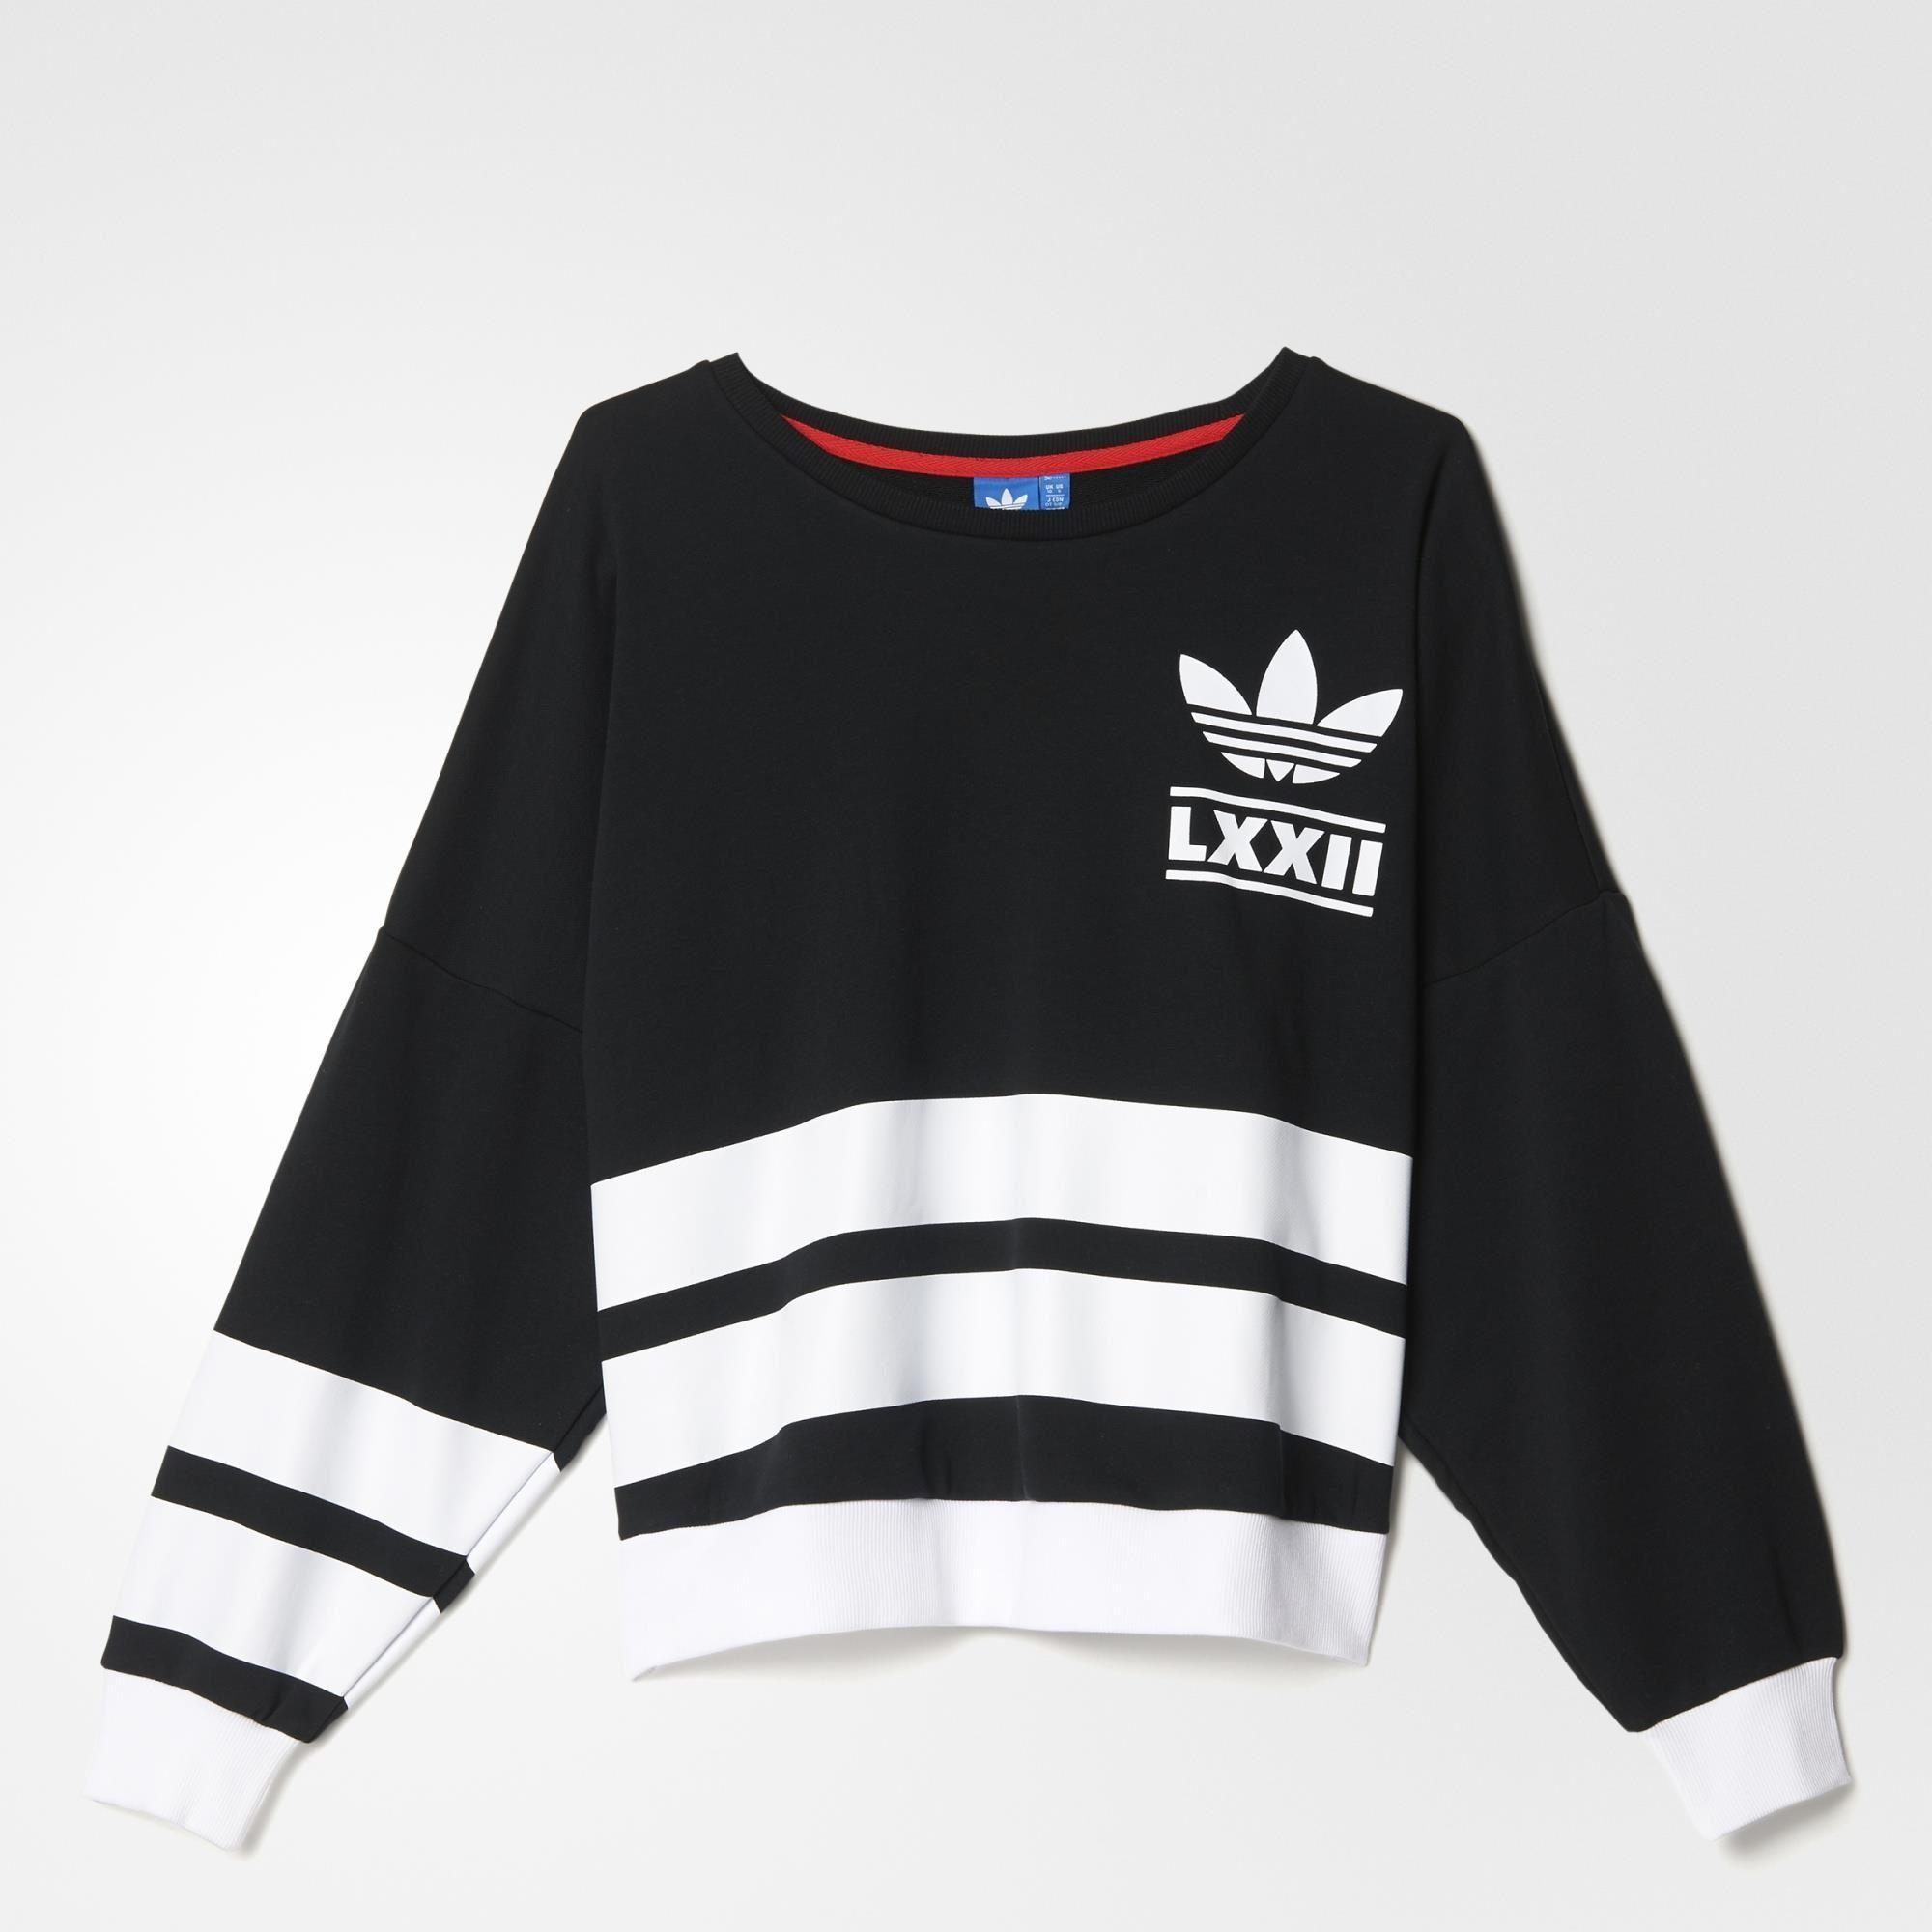 Adidas Berlin Logo 3 Stripes Crew Sweatshirt Black Adidas Us Striped Sweatshirts Adidas Women Black Sweatshirts [ 2000 x 2000 Pixel ]